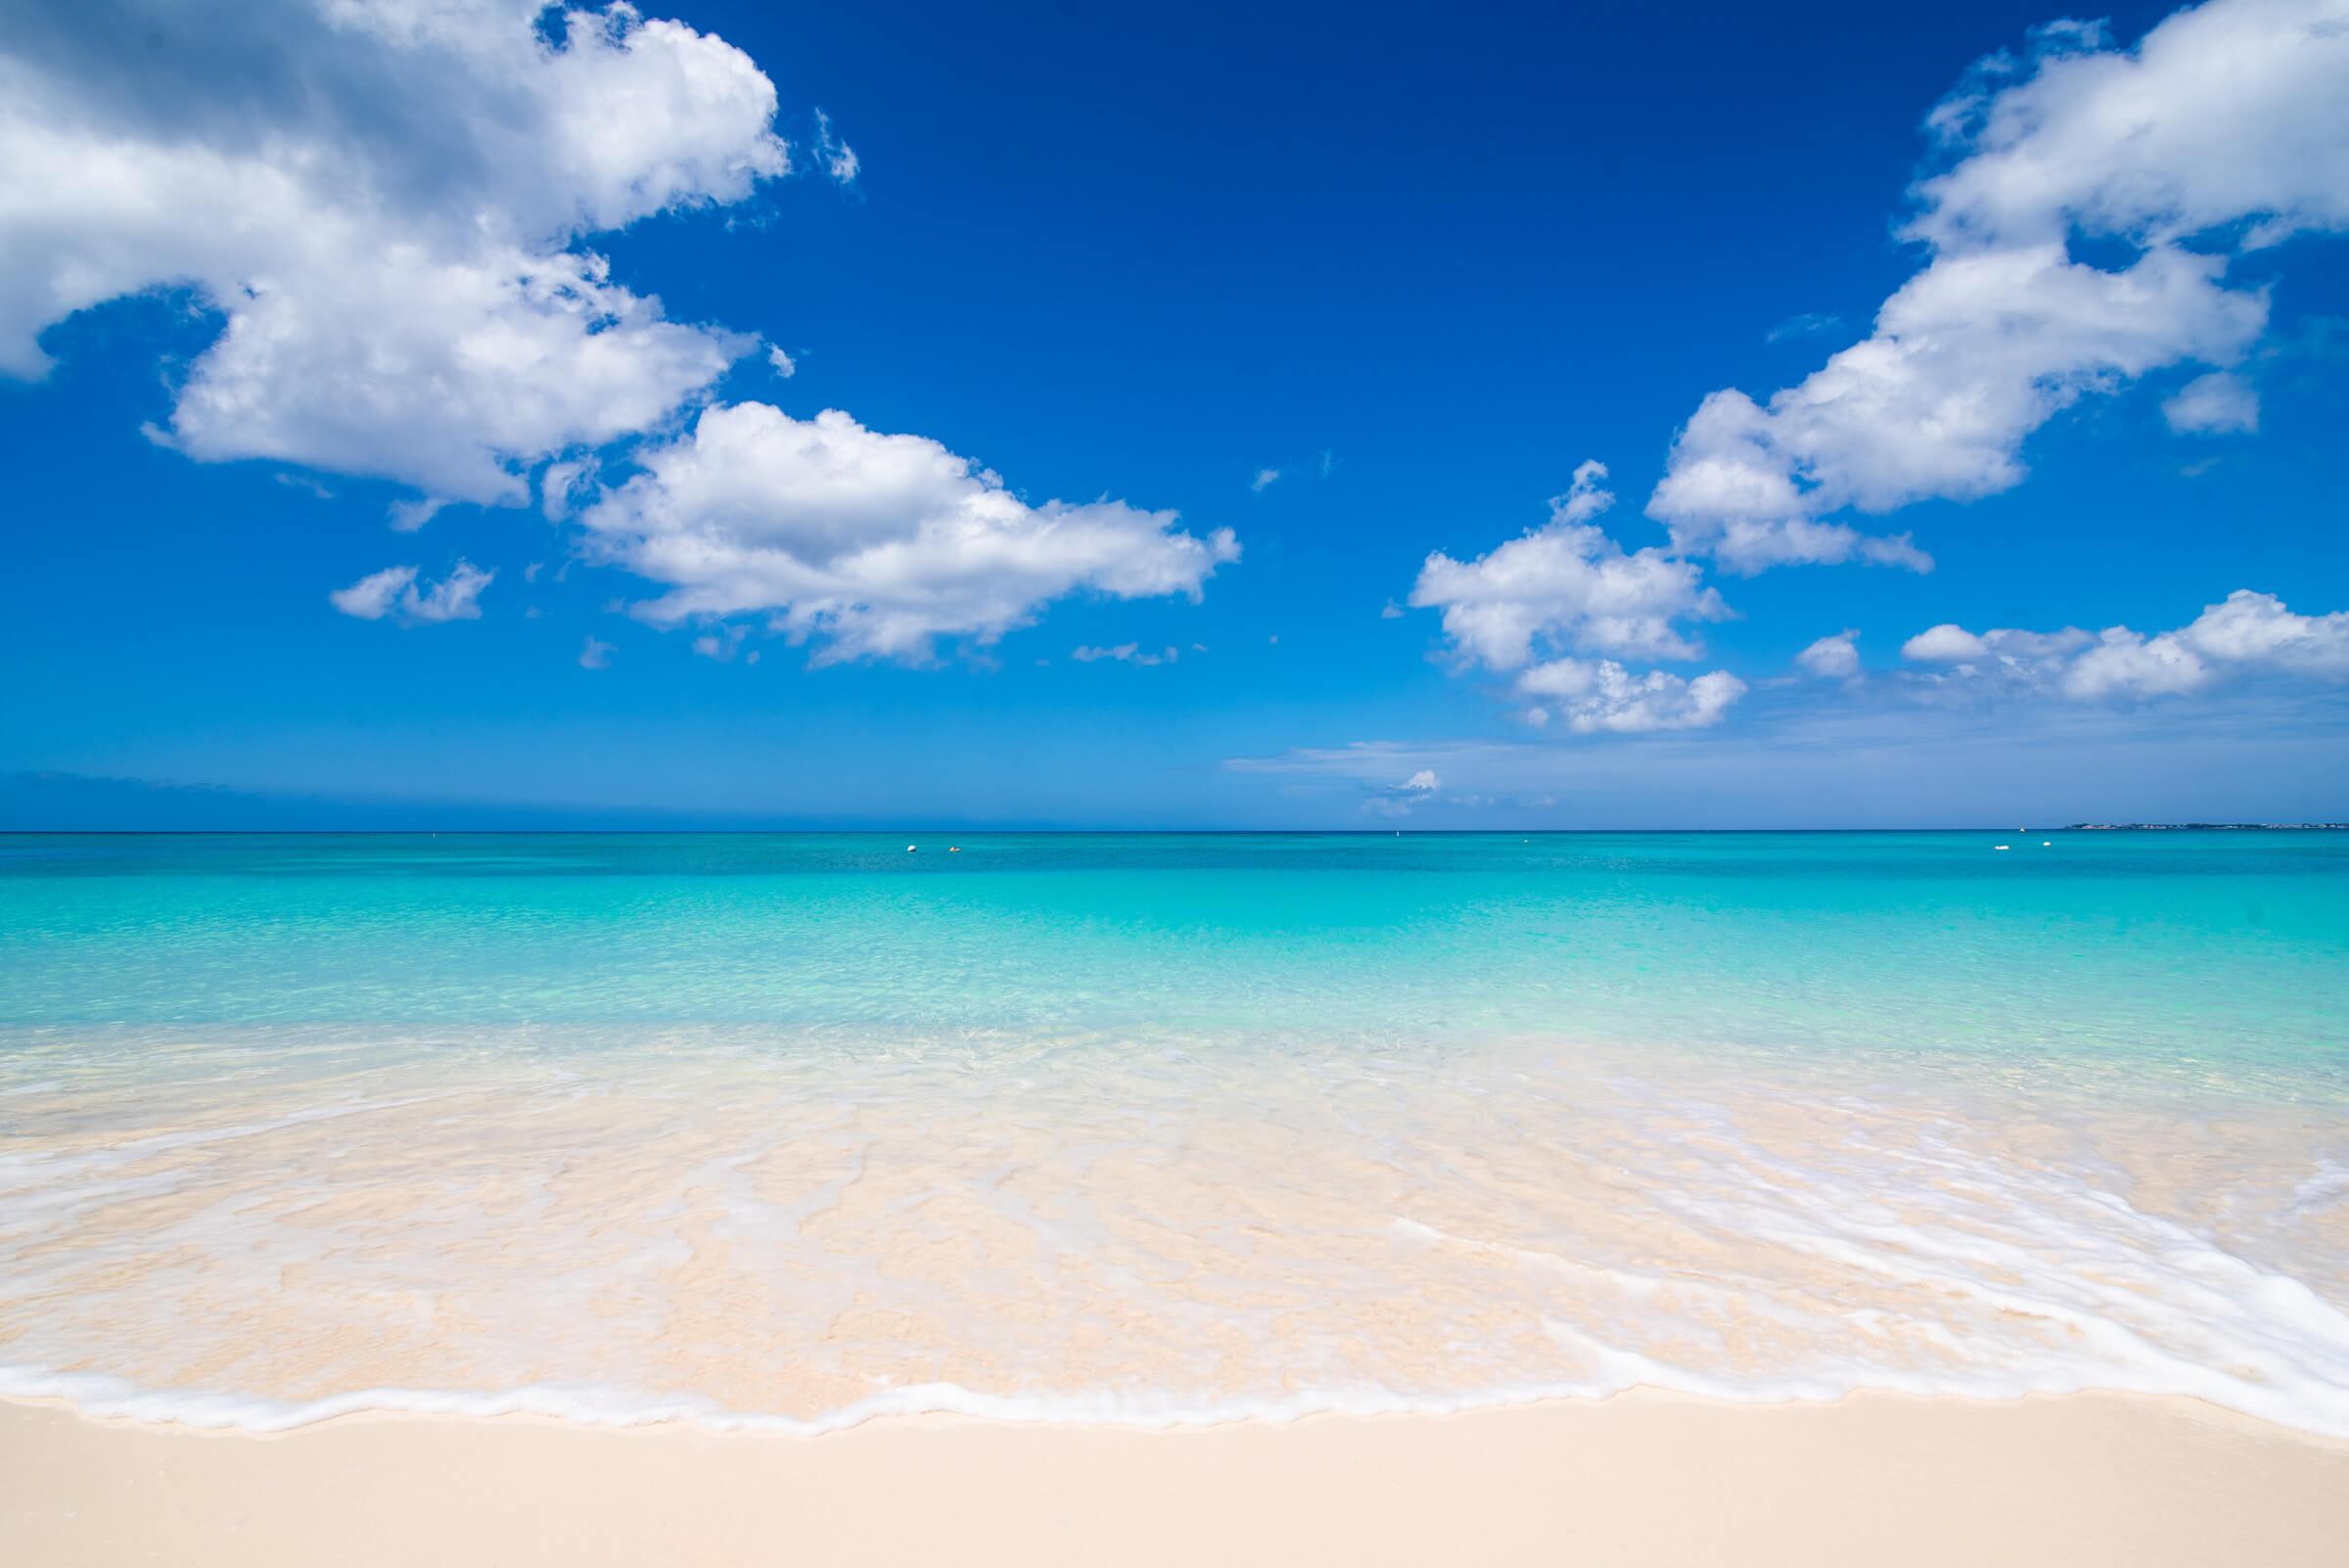 Seascape Villa Cayman Islands Grand Cayman Beachfront Luxury Caribbean Vacation Seven Mile Beach